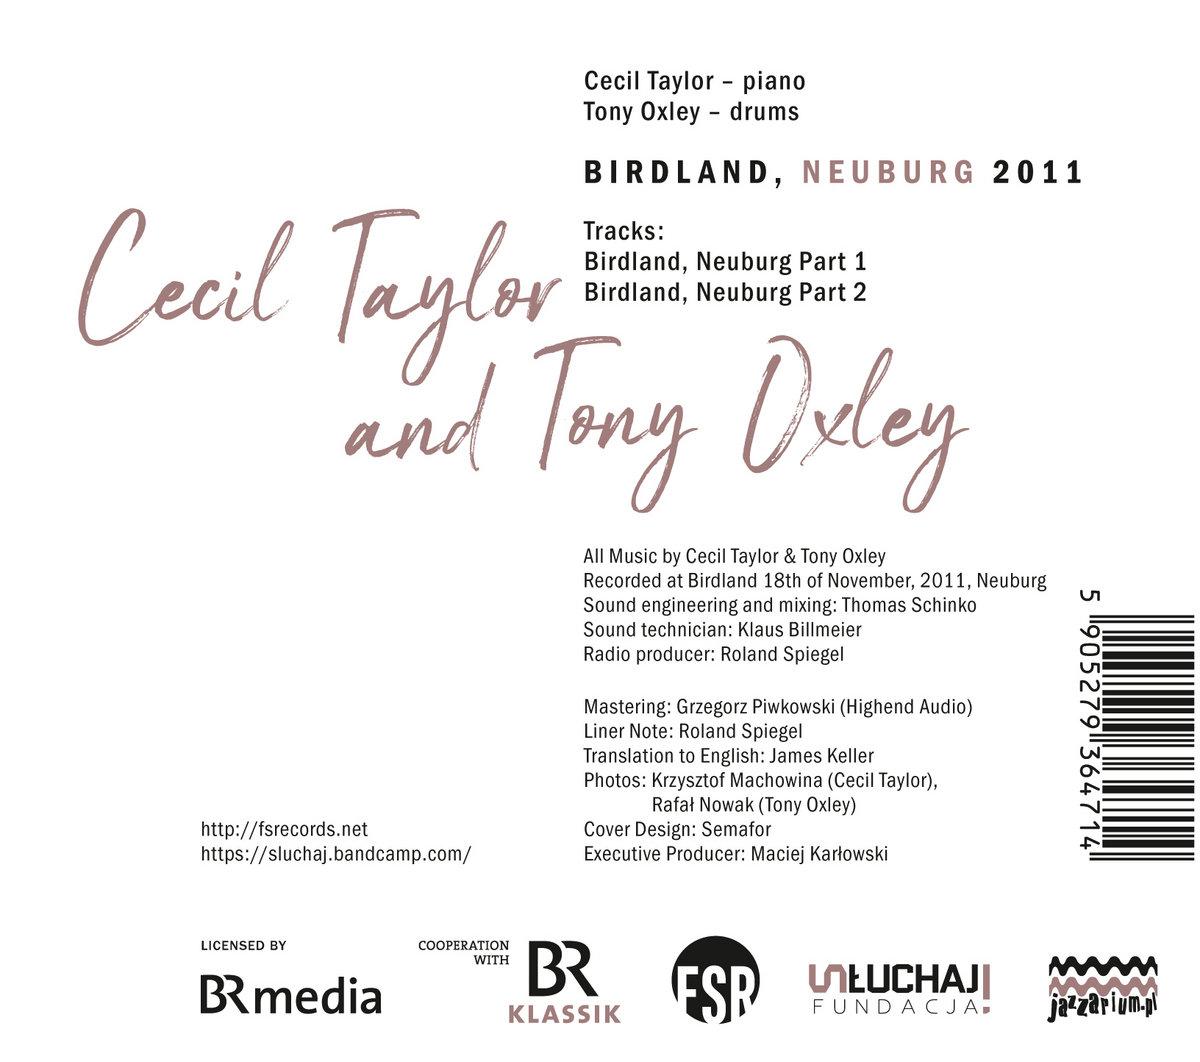 Birdland, Neuburg 2011 part 2 | Cecil Taylor & Tony Oxley | Fundacja Słuchaj